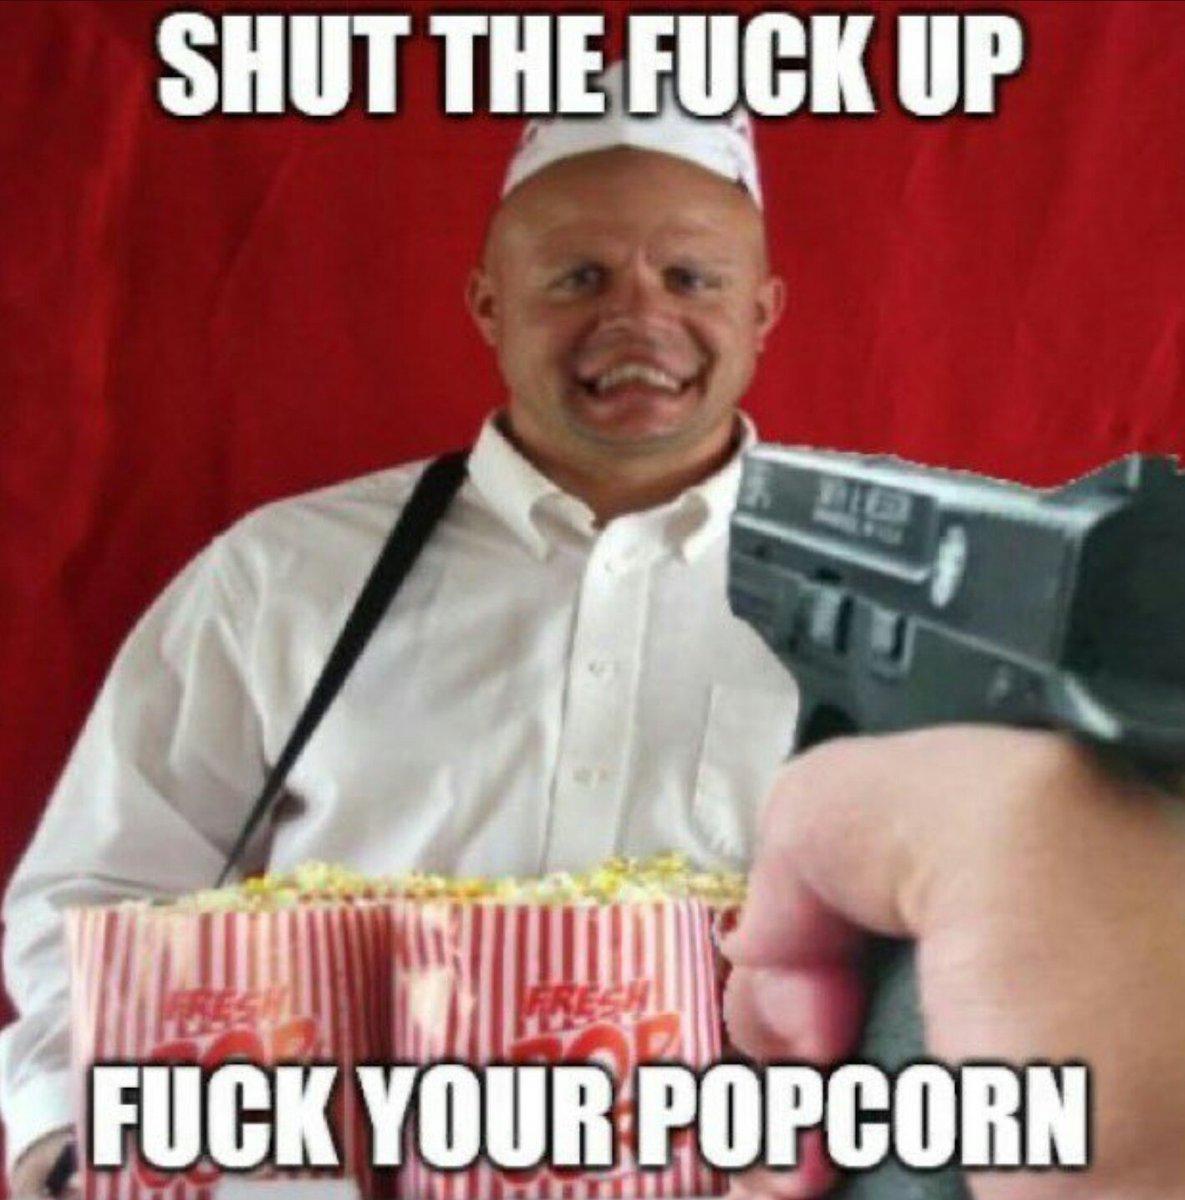 @The_PopcornMan @Xbox